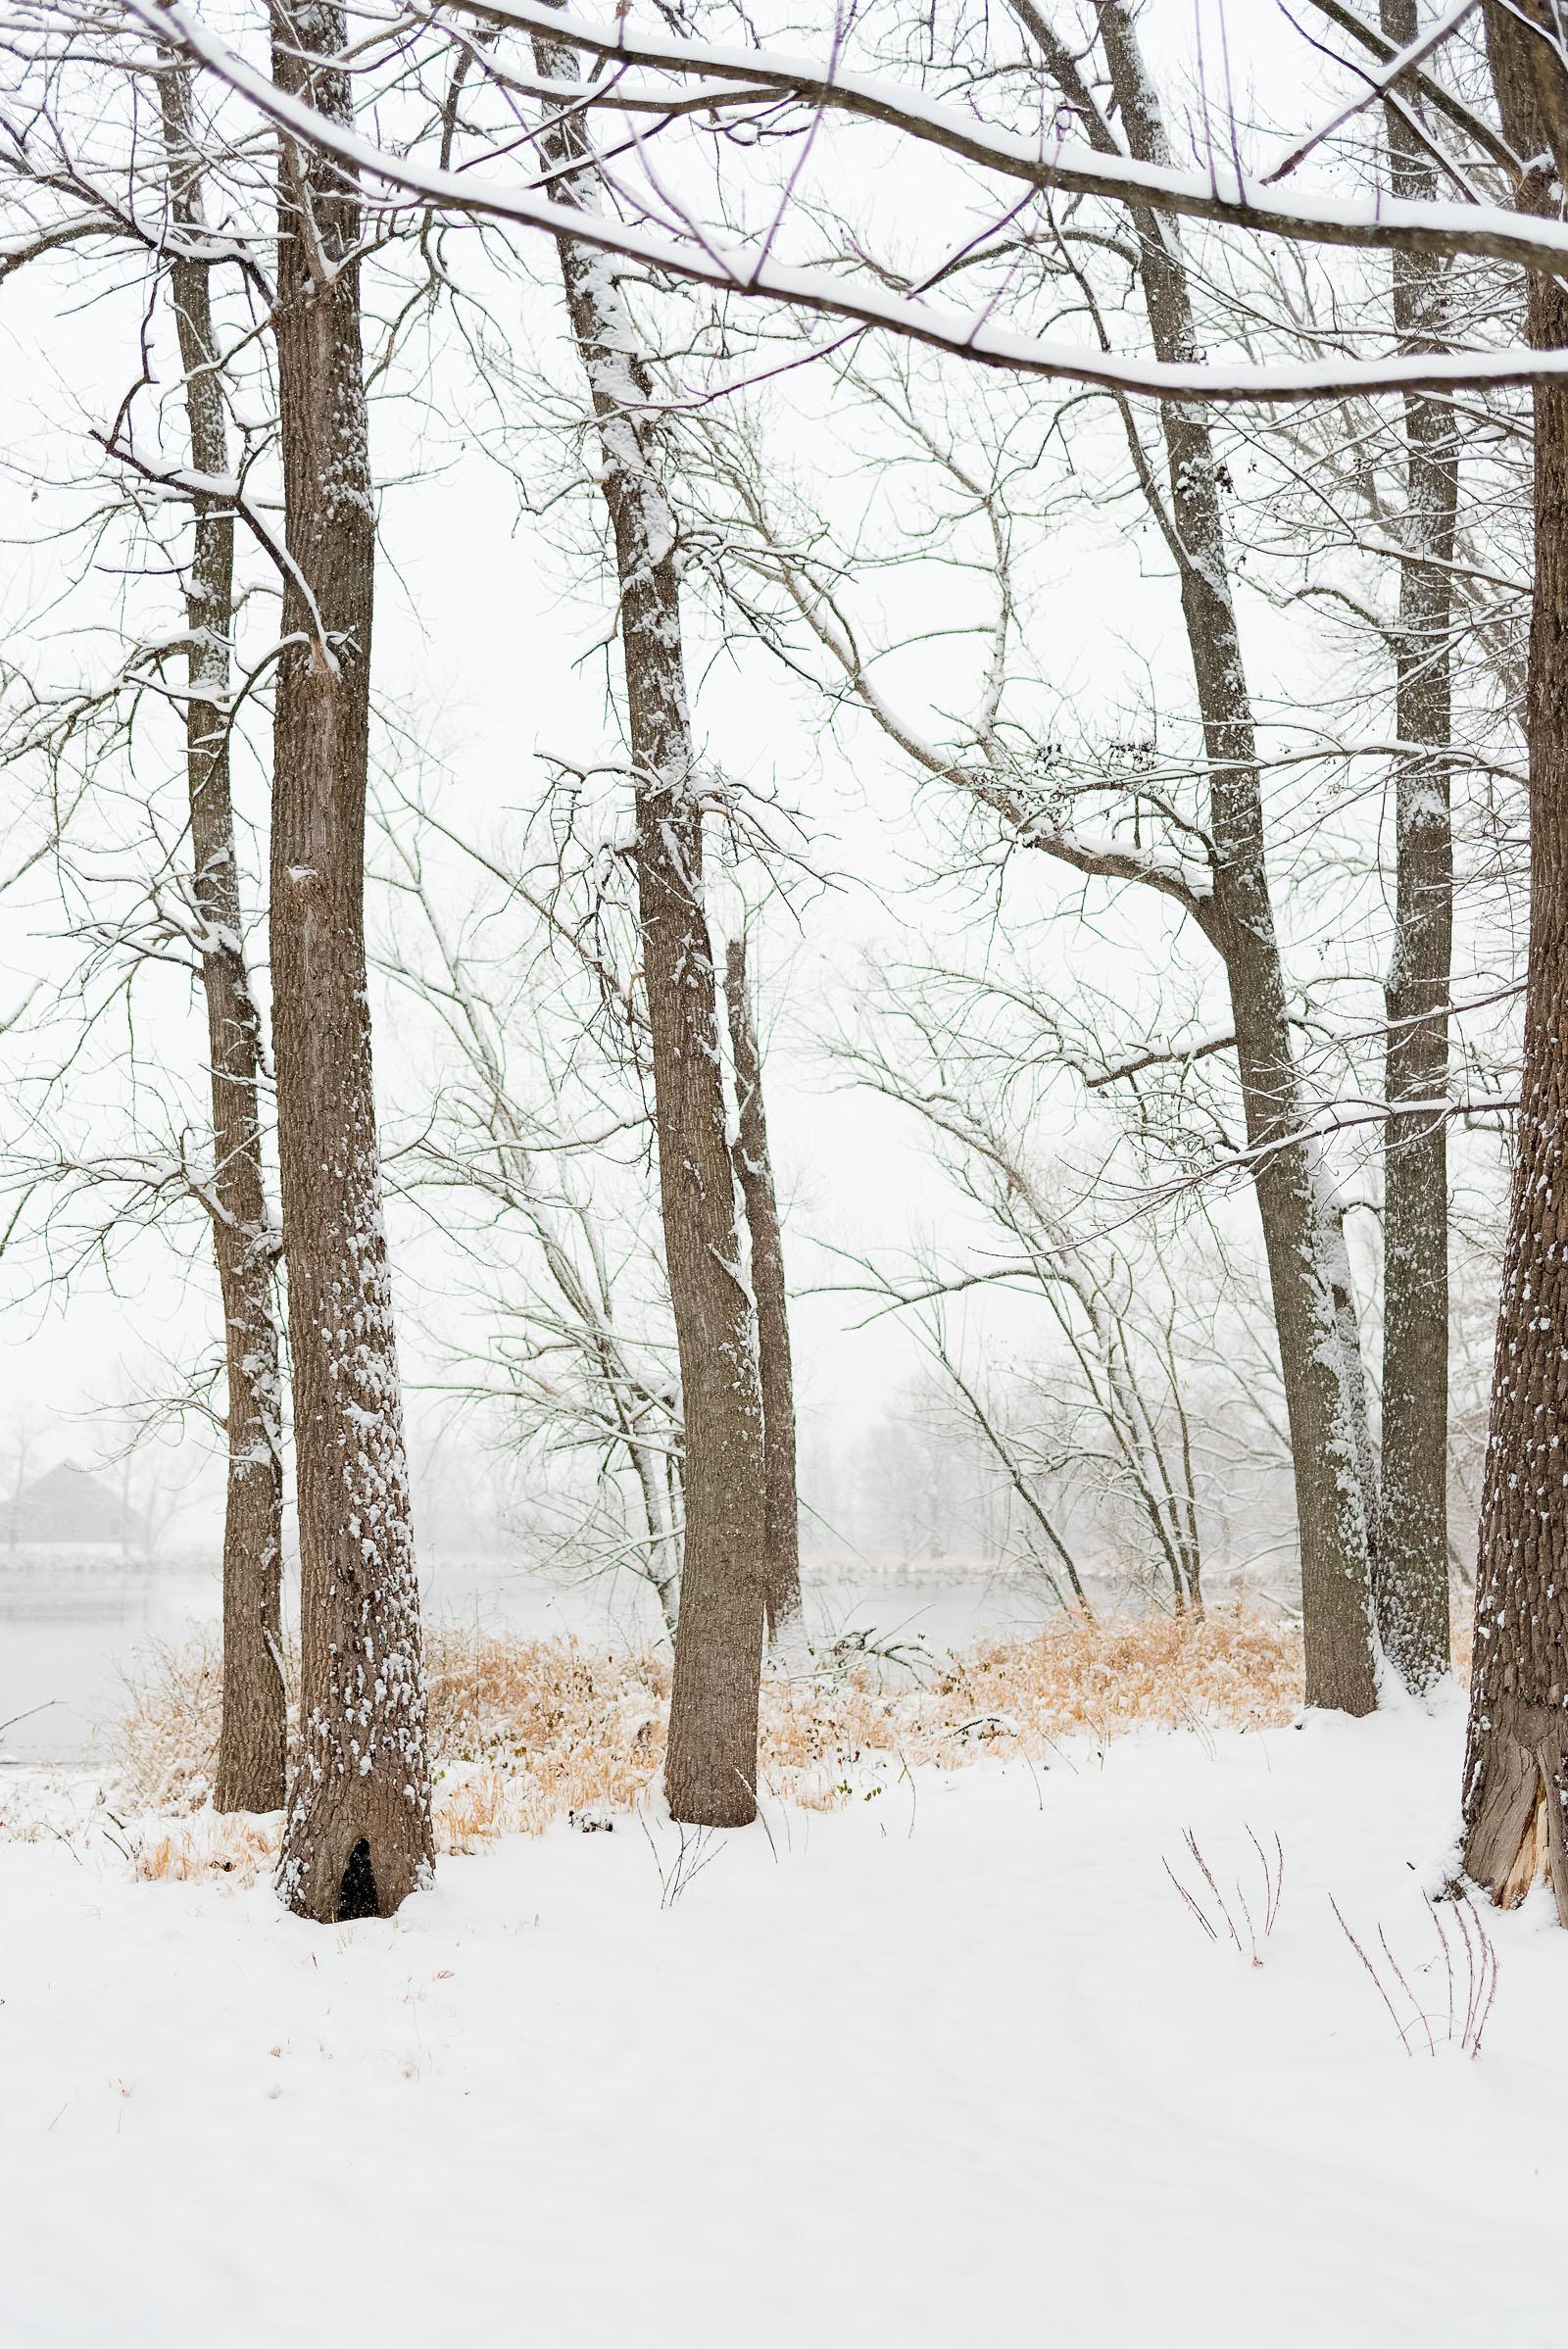 Winter Snow 2017